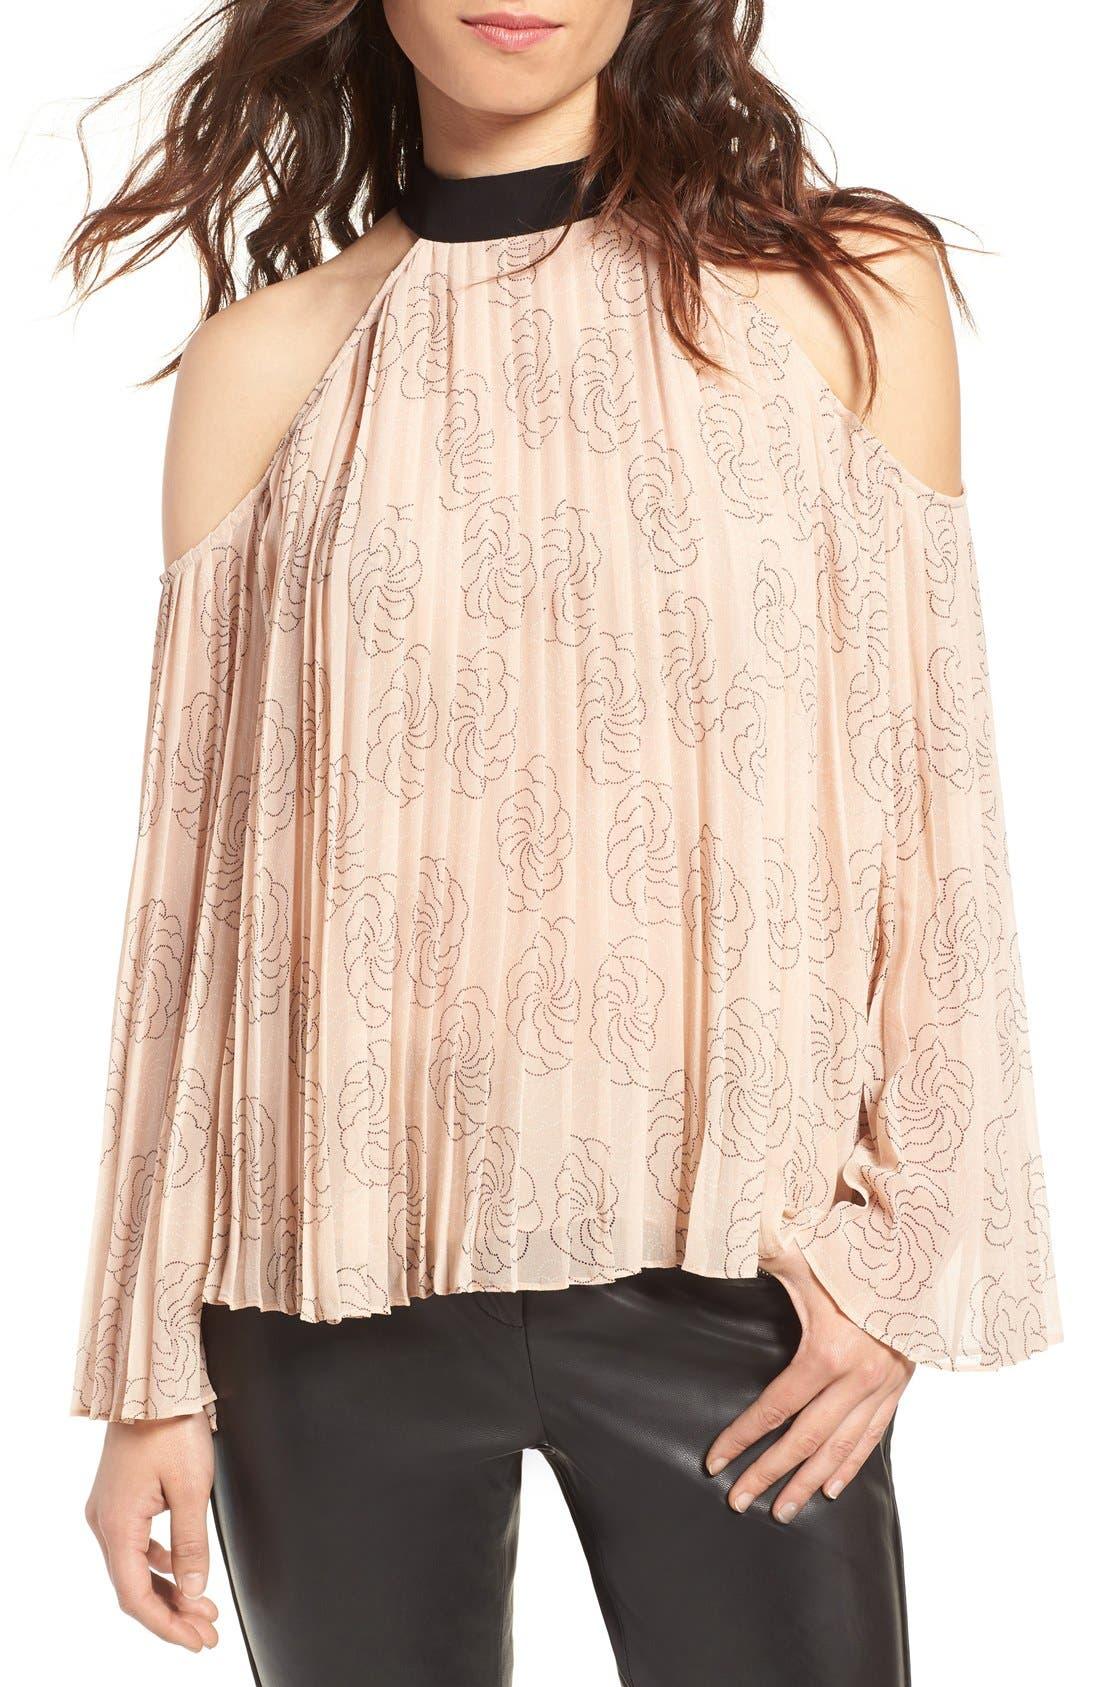 Alternate Image 1 Selected - Chelsea28 Pleat Cold Shoulder Top